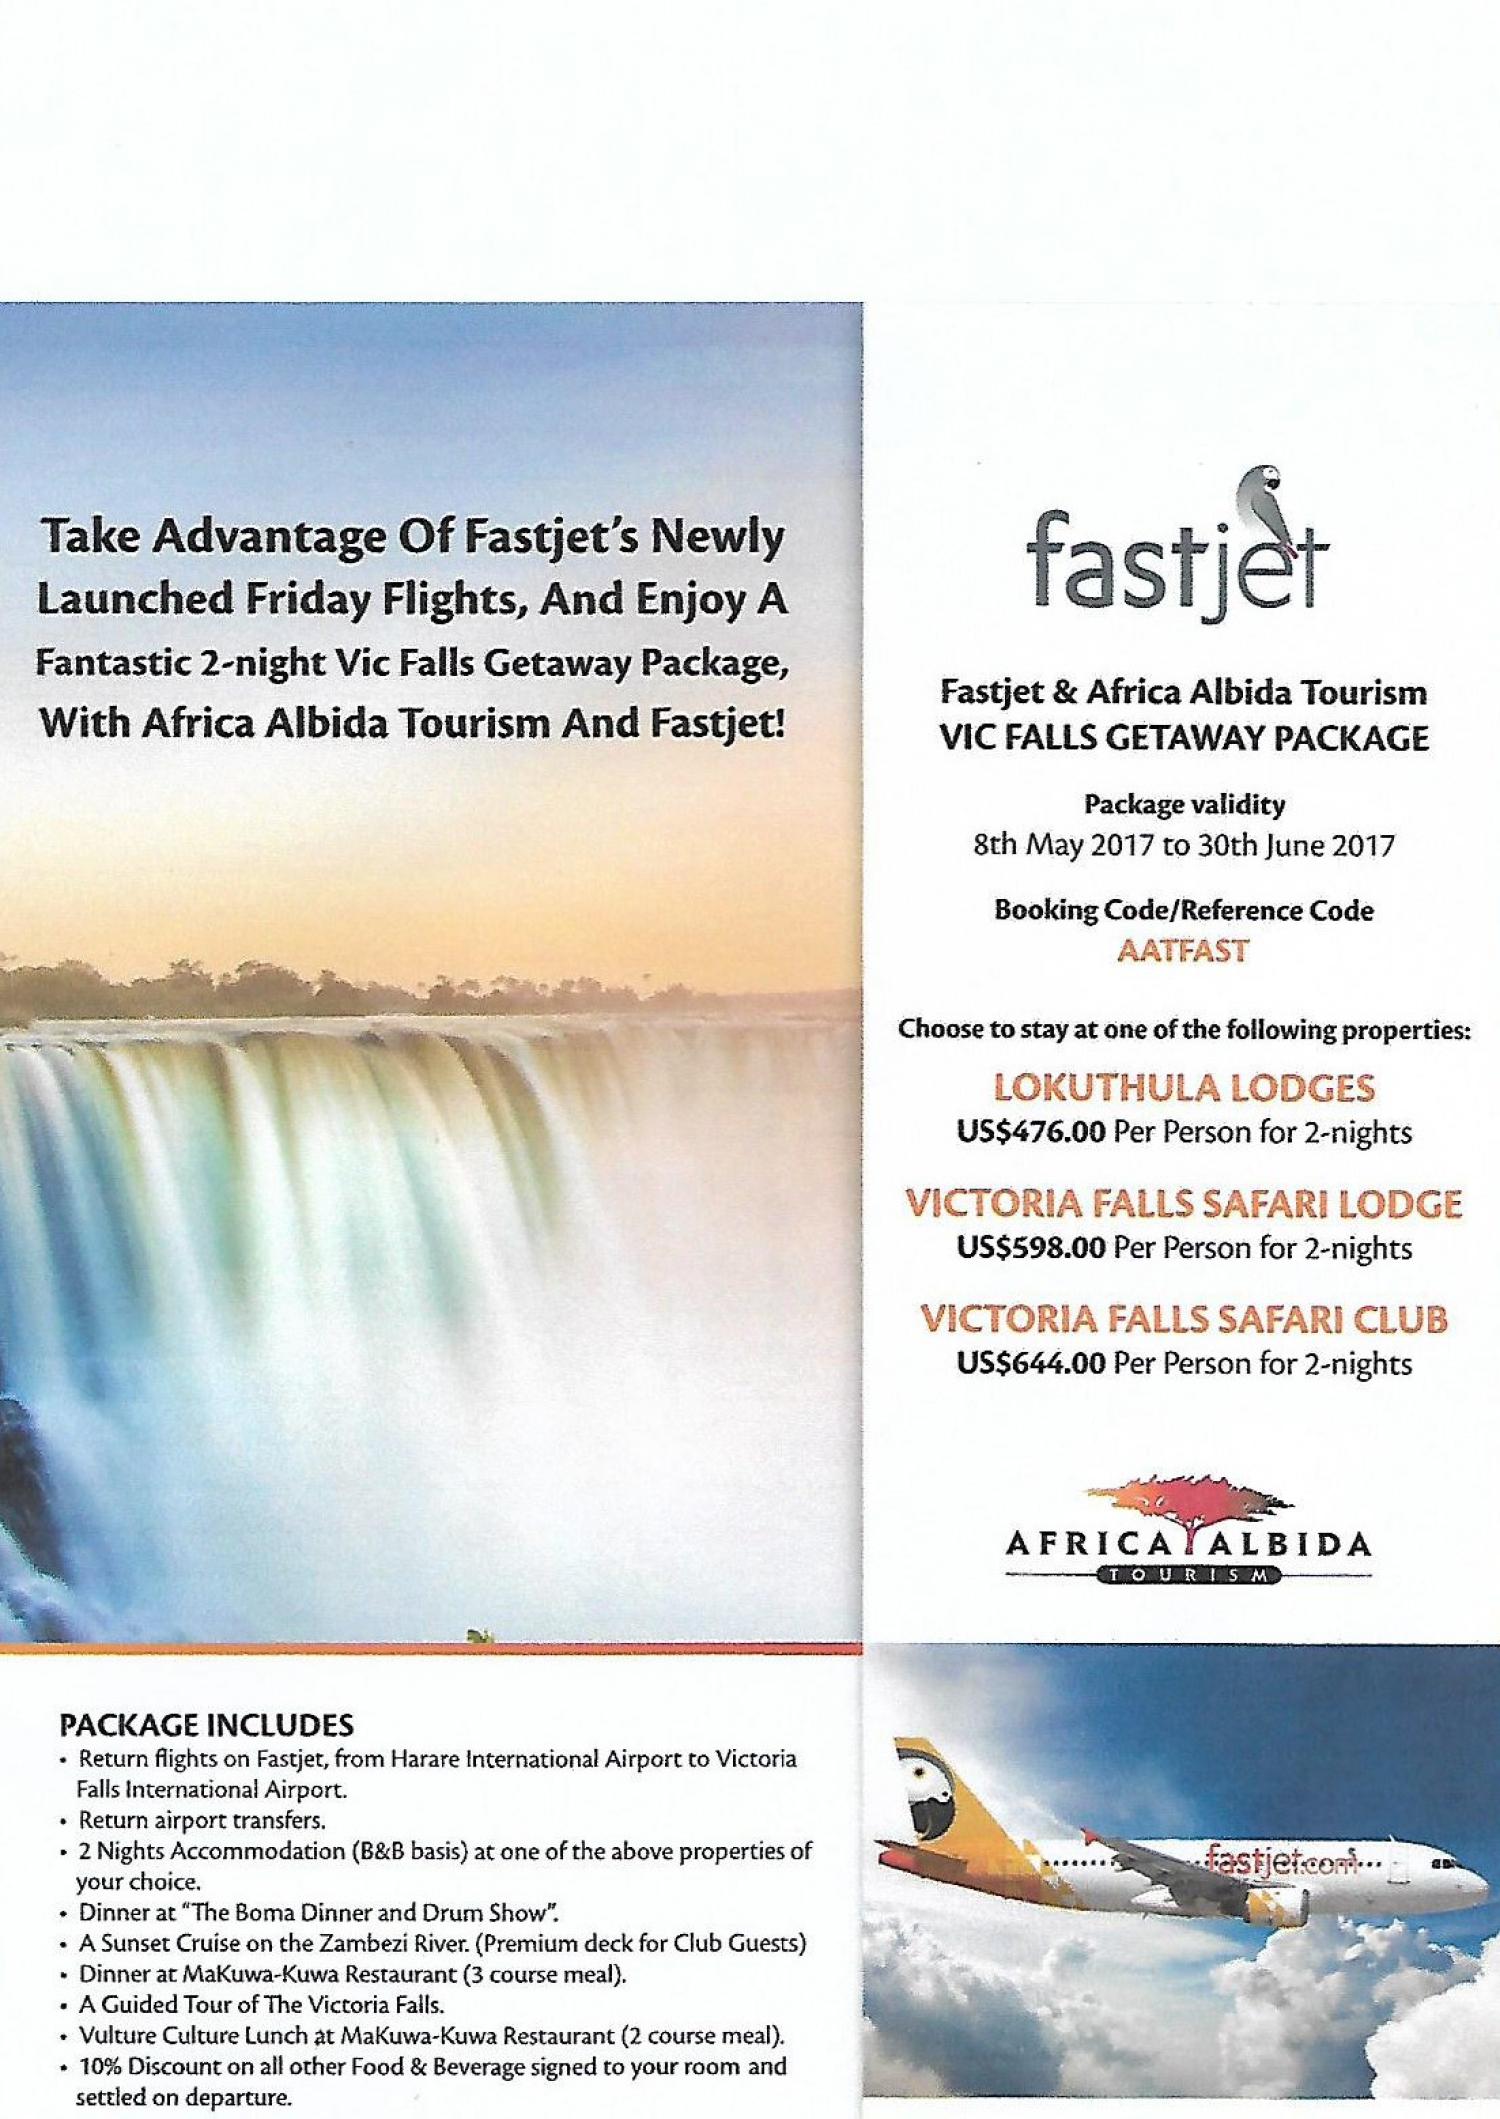 FASTJET AND AFRICA ALBIDA TOURISM VIC FALLS GETAWAY SPECIAL